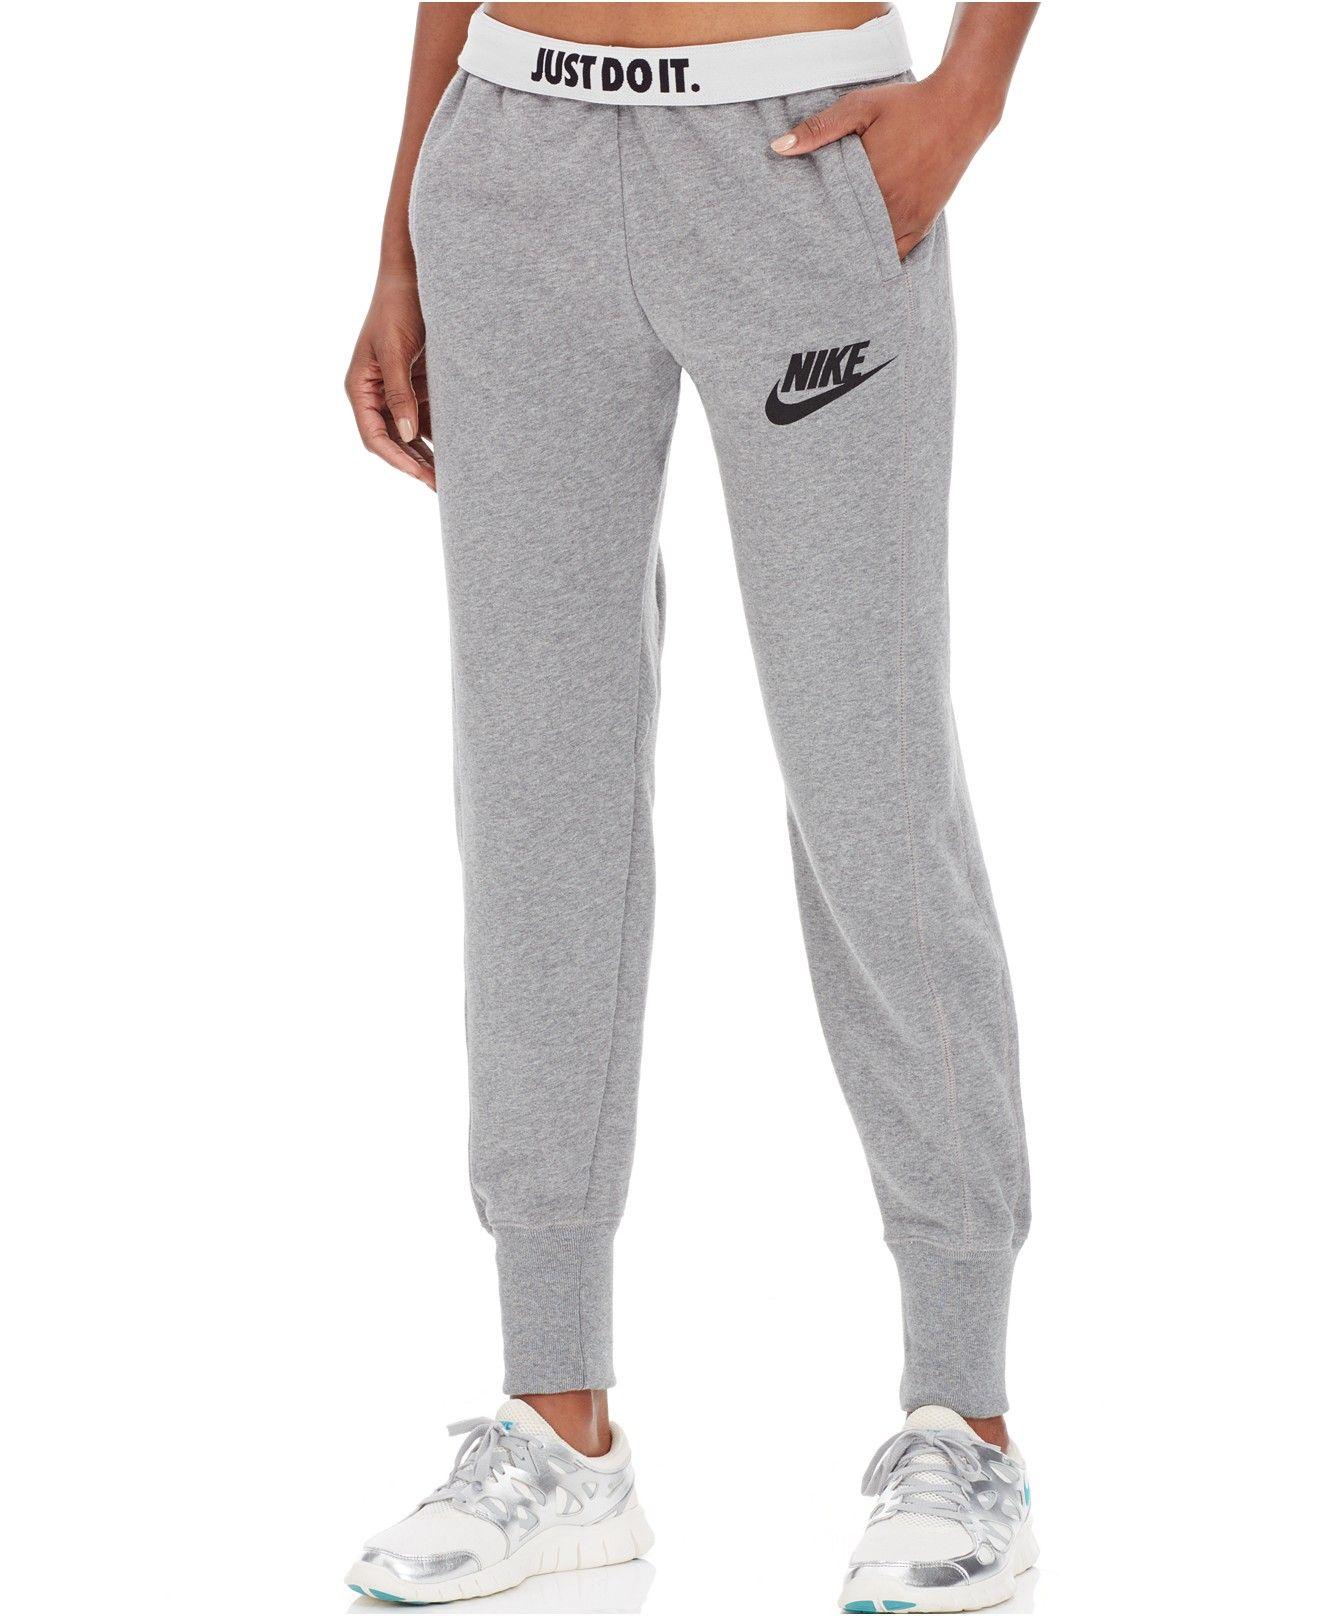 00fb21b16358 Nike Rally Jogger Pants - Nike - Women - Macy s